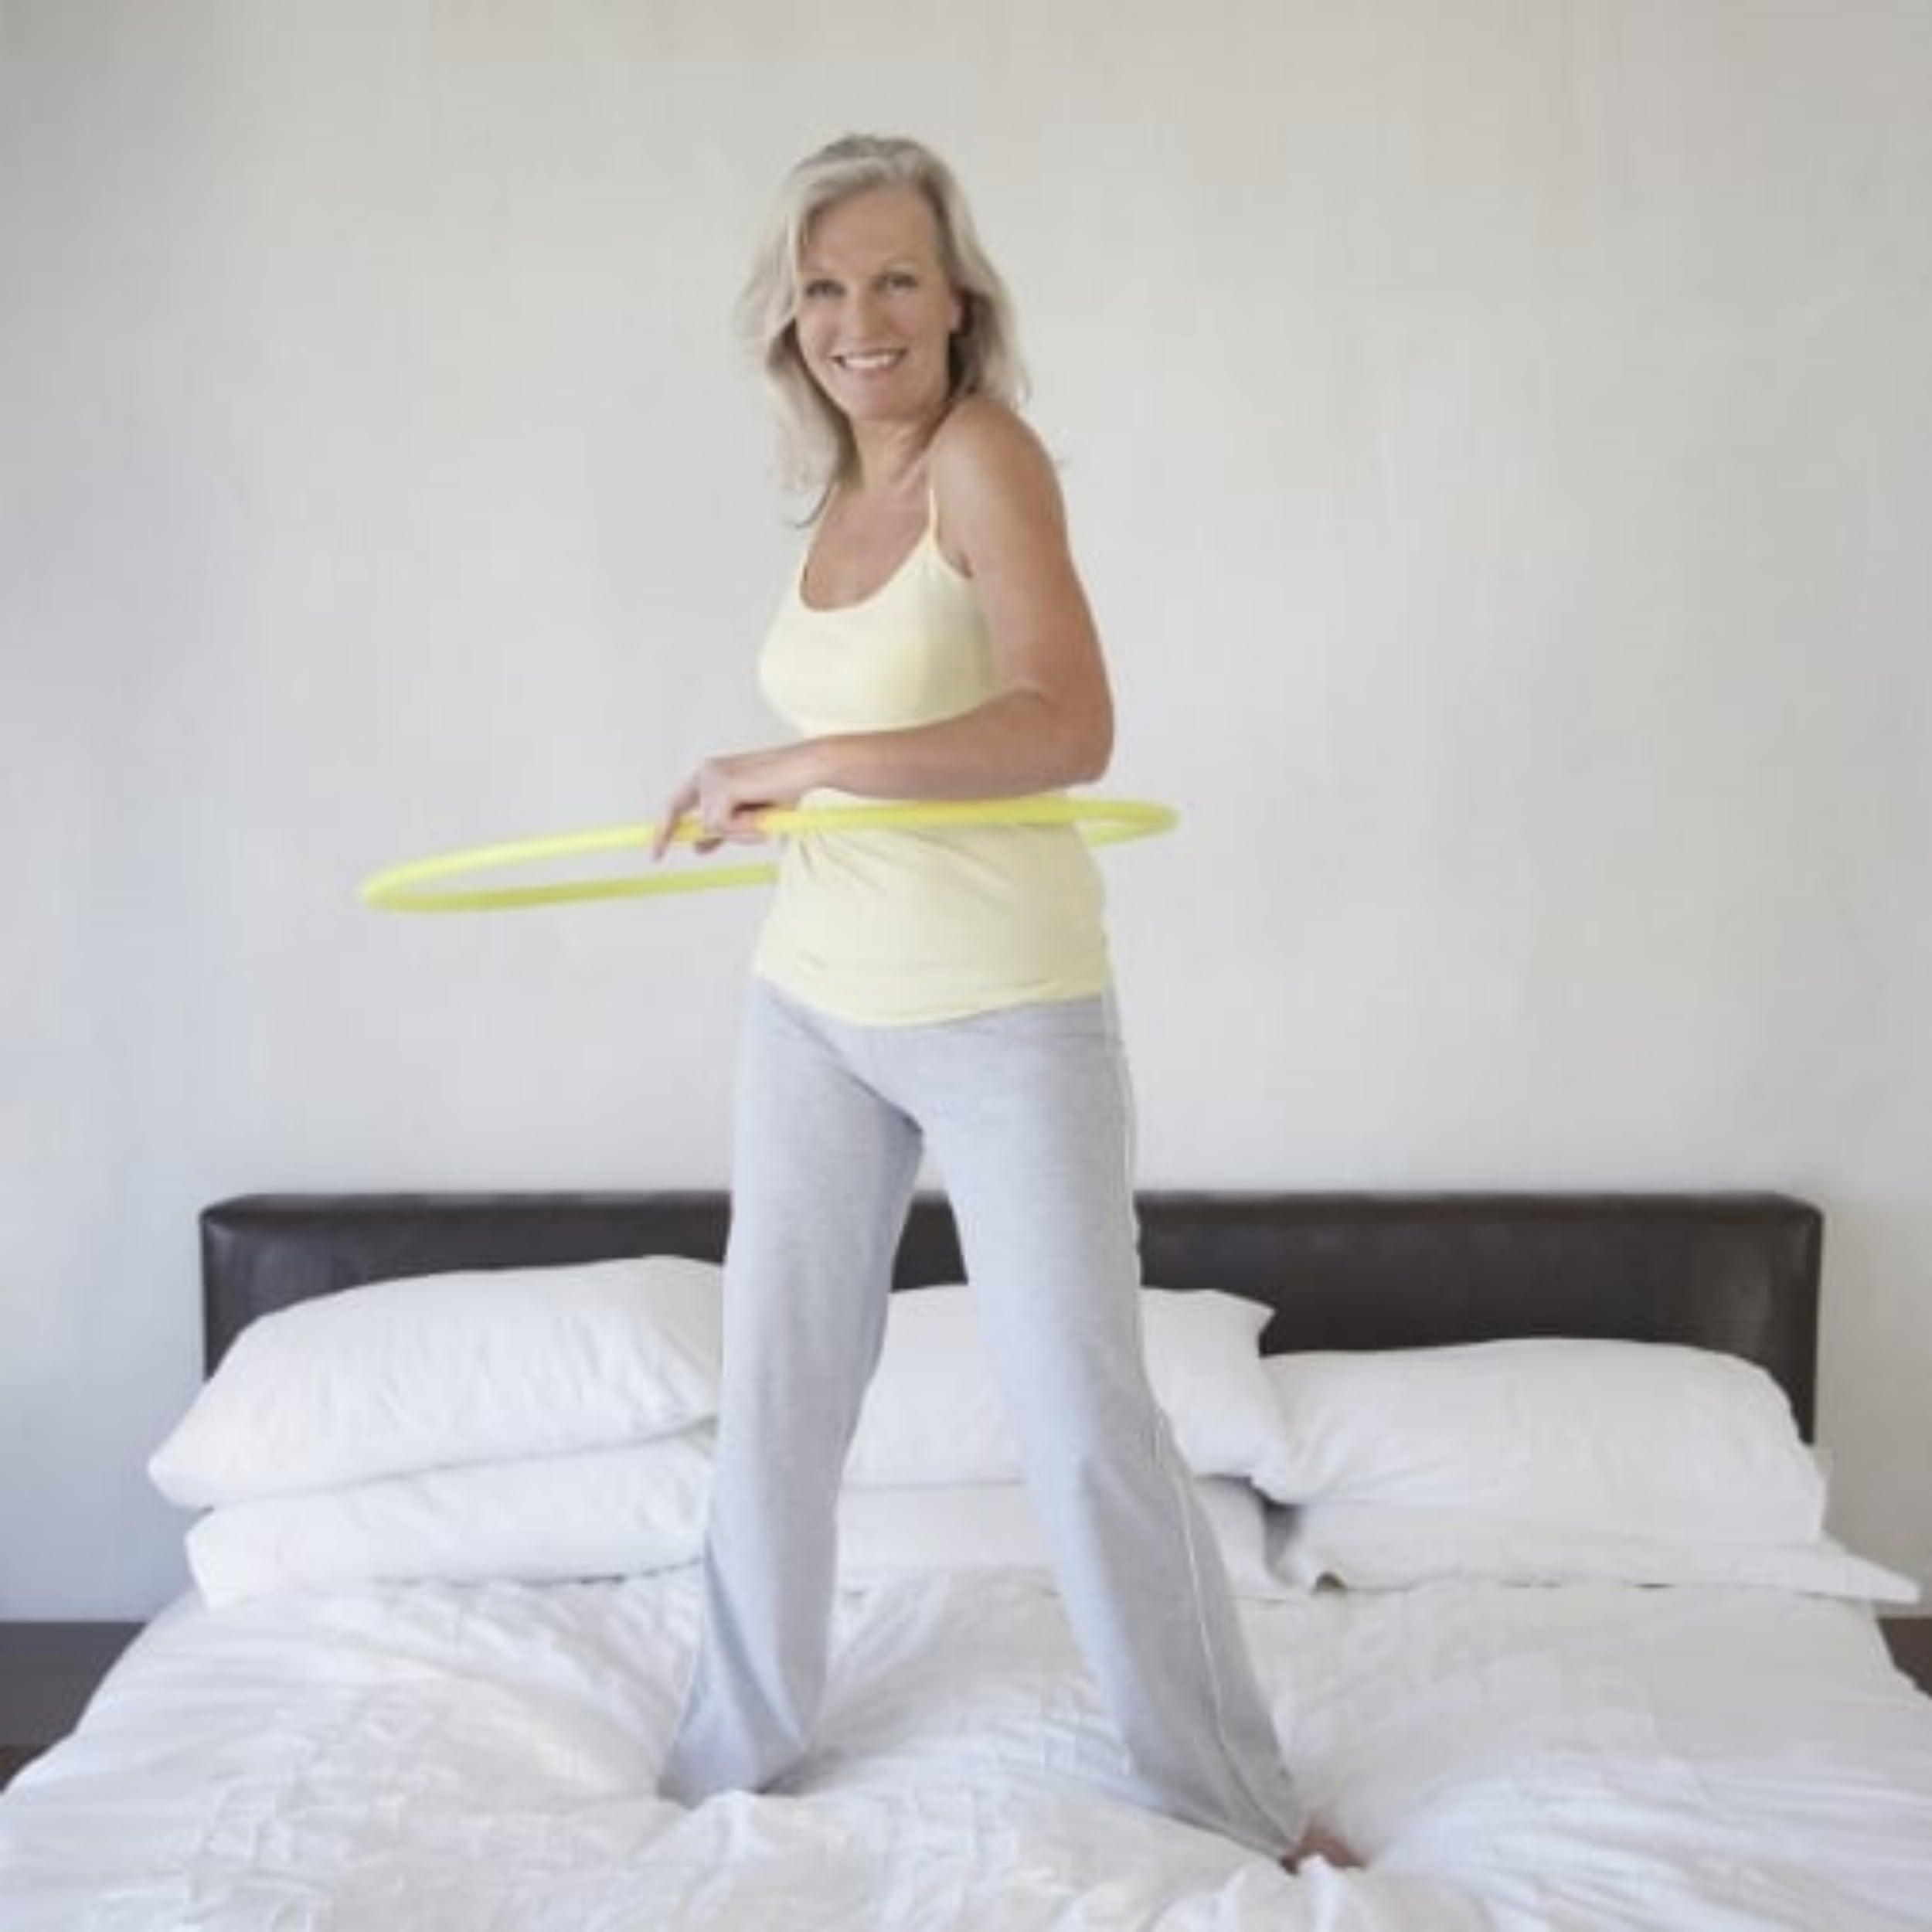 golden hula hoop woman.jpg